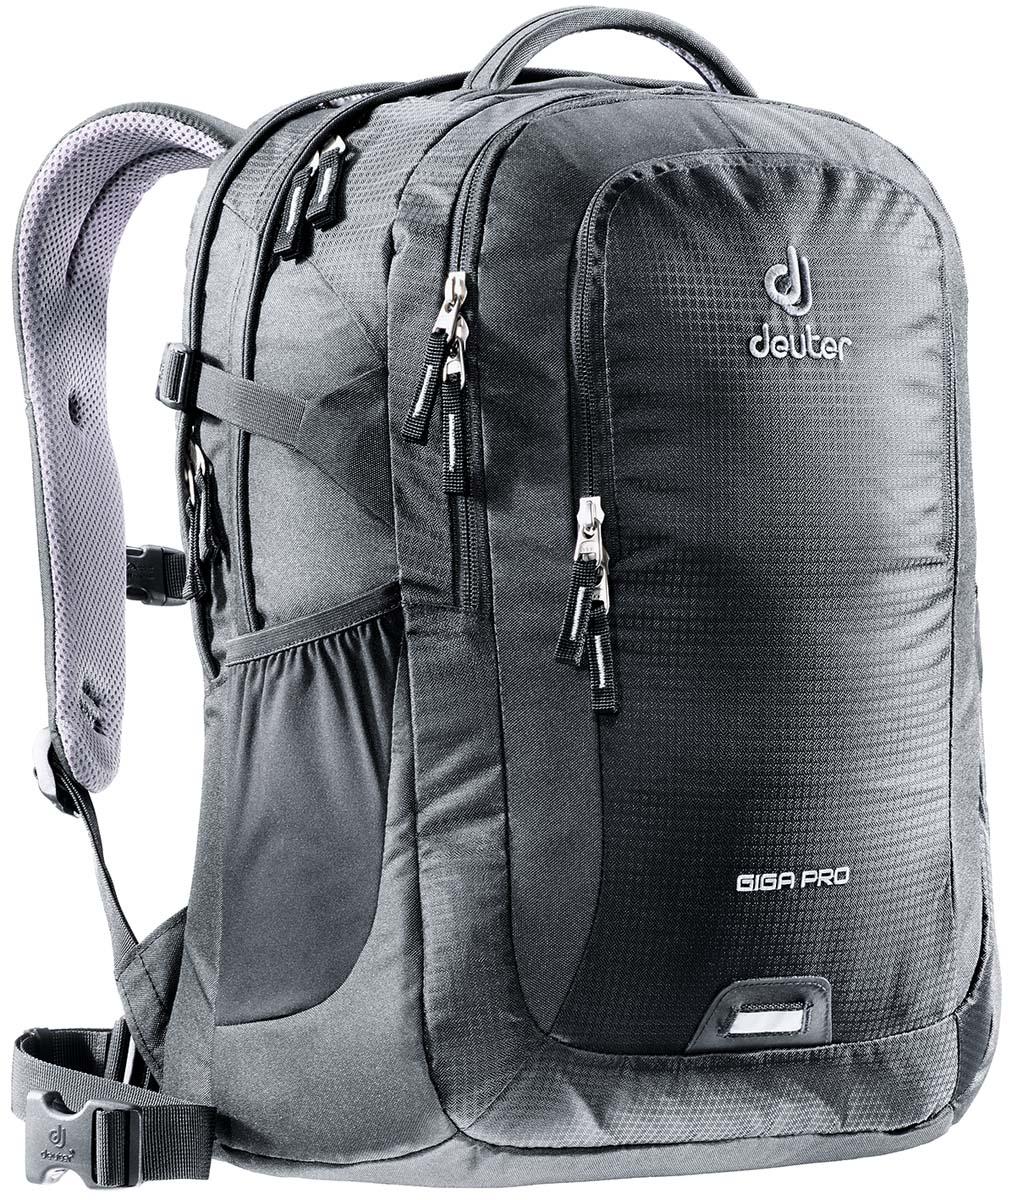 Рюкзак Deuter Daypacks Giga Pro, цвет: черный, 31 л рюкзак deuter daypacks giga pro цвет черный серый 31 л